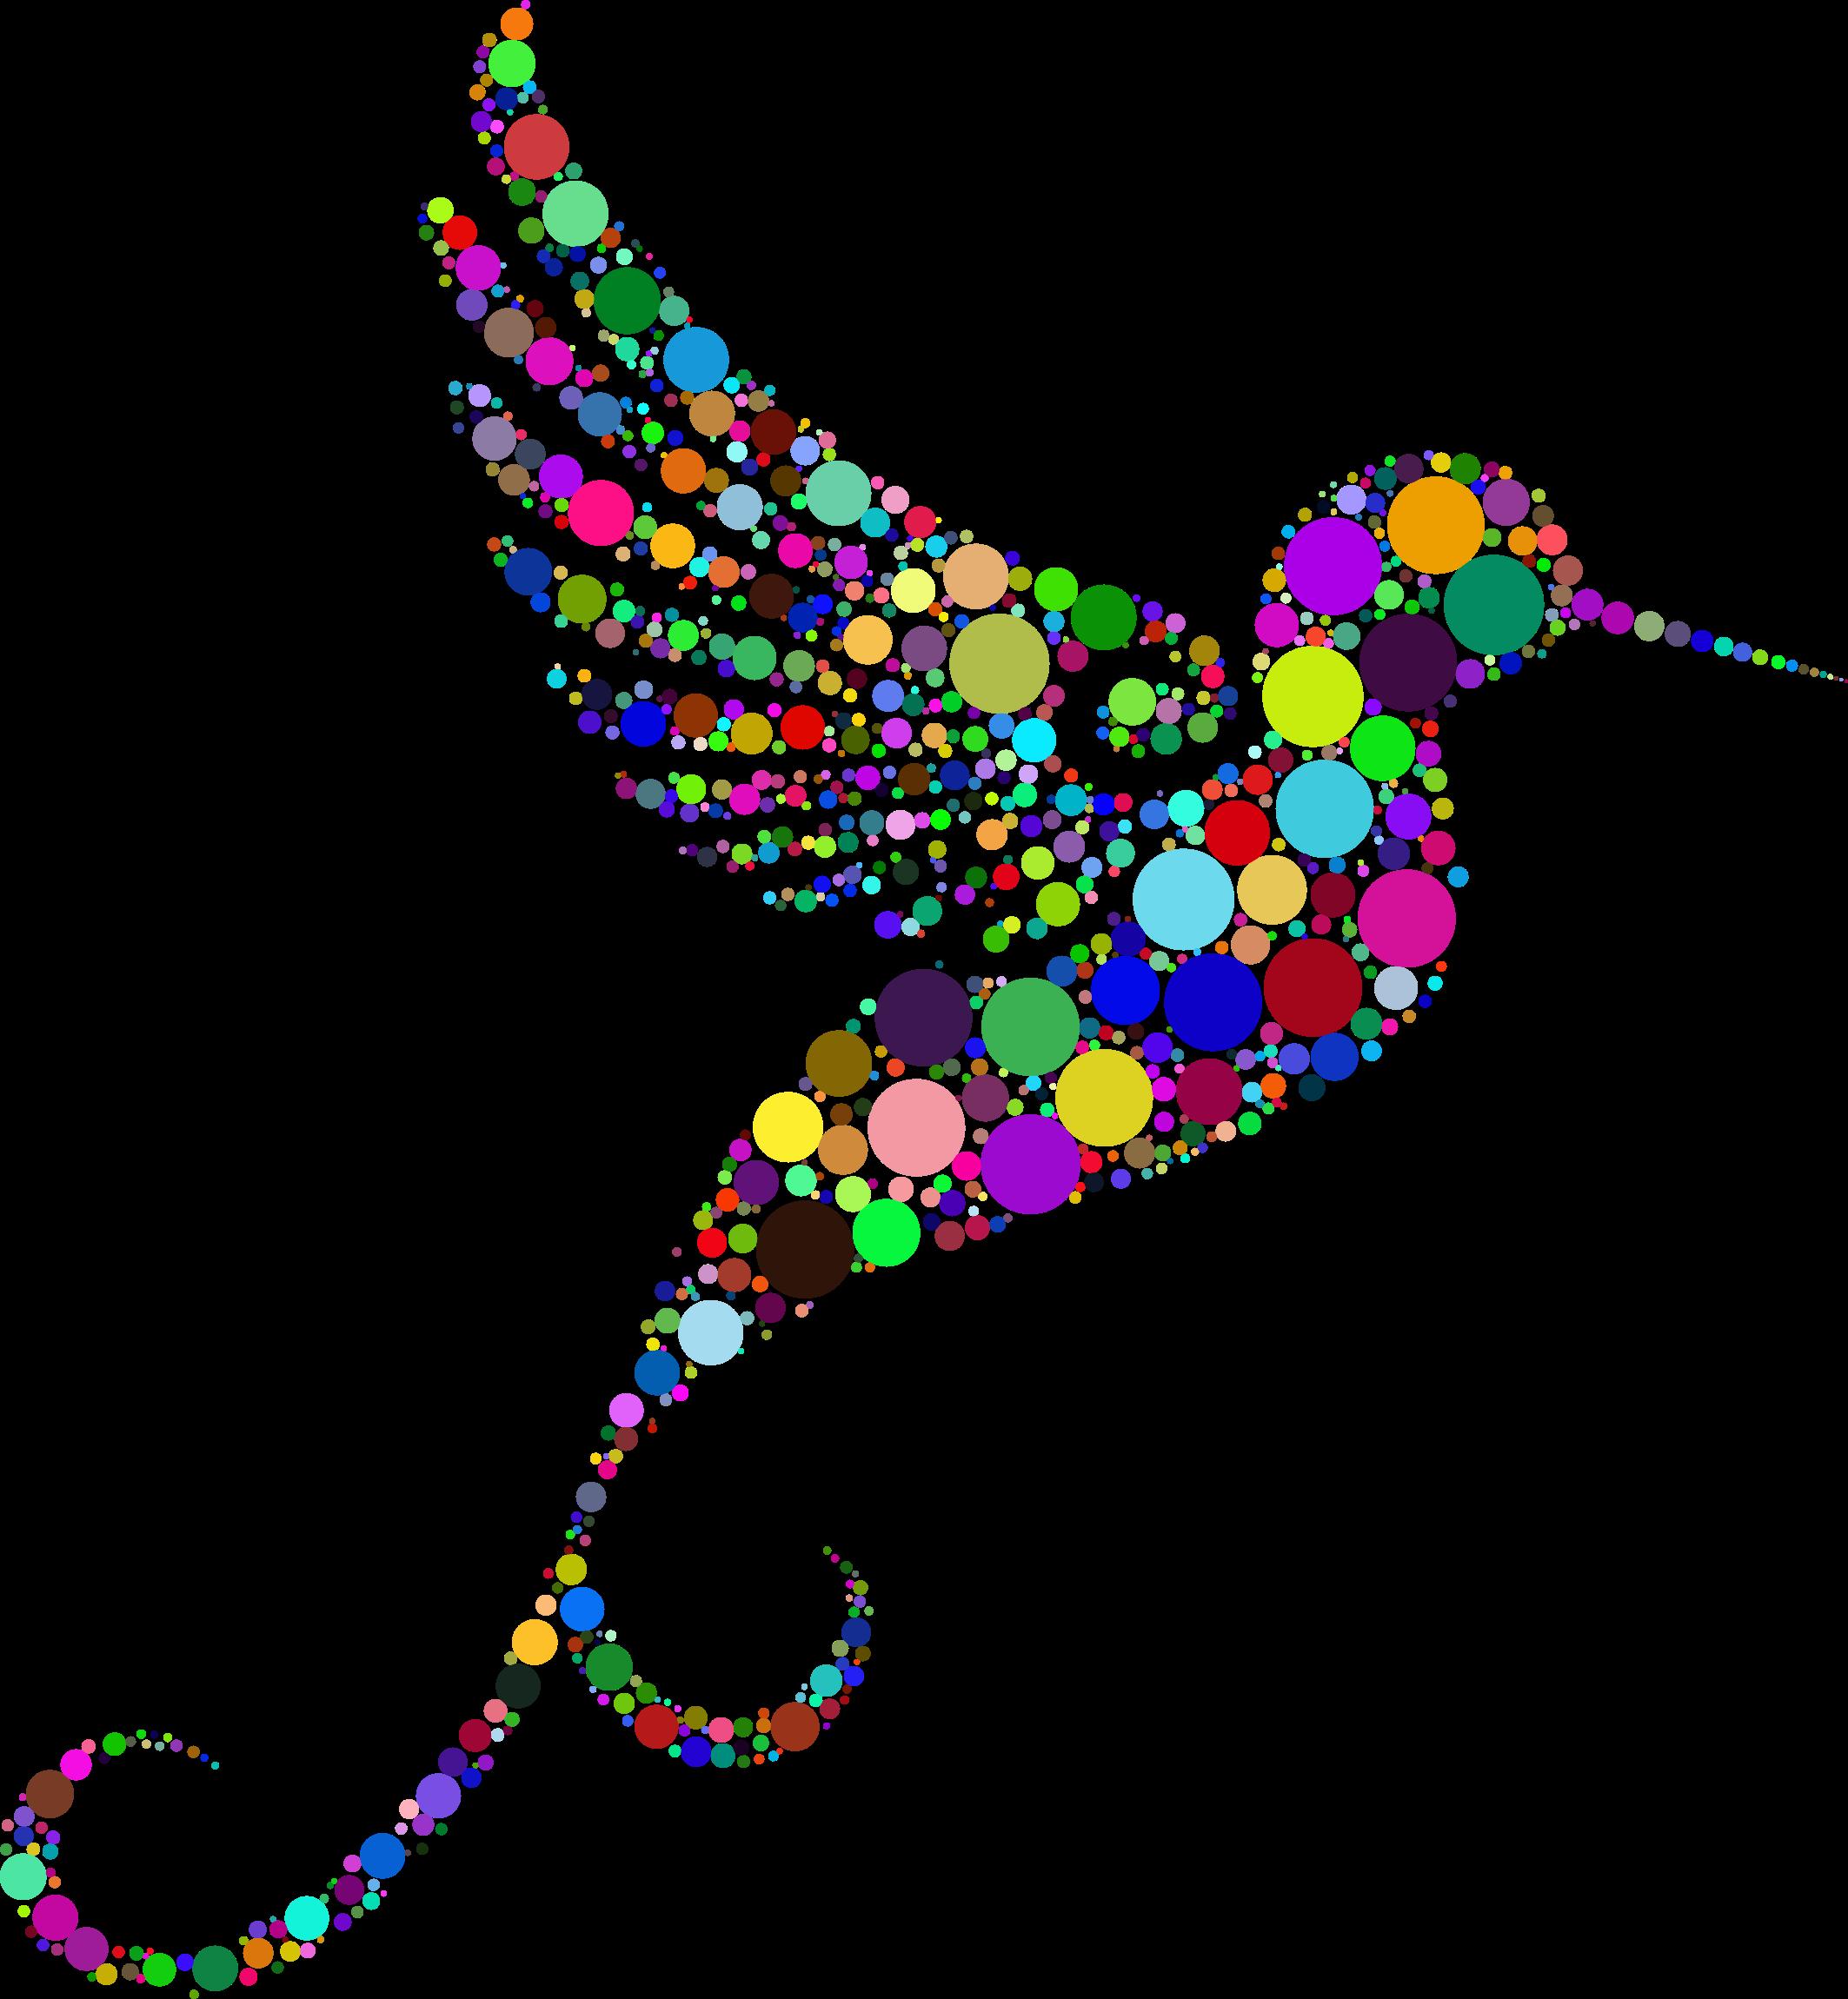 Prismatic circles big image. Hummingbird clipart rainbow